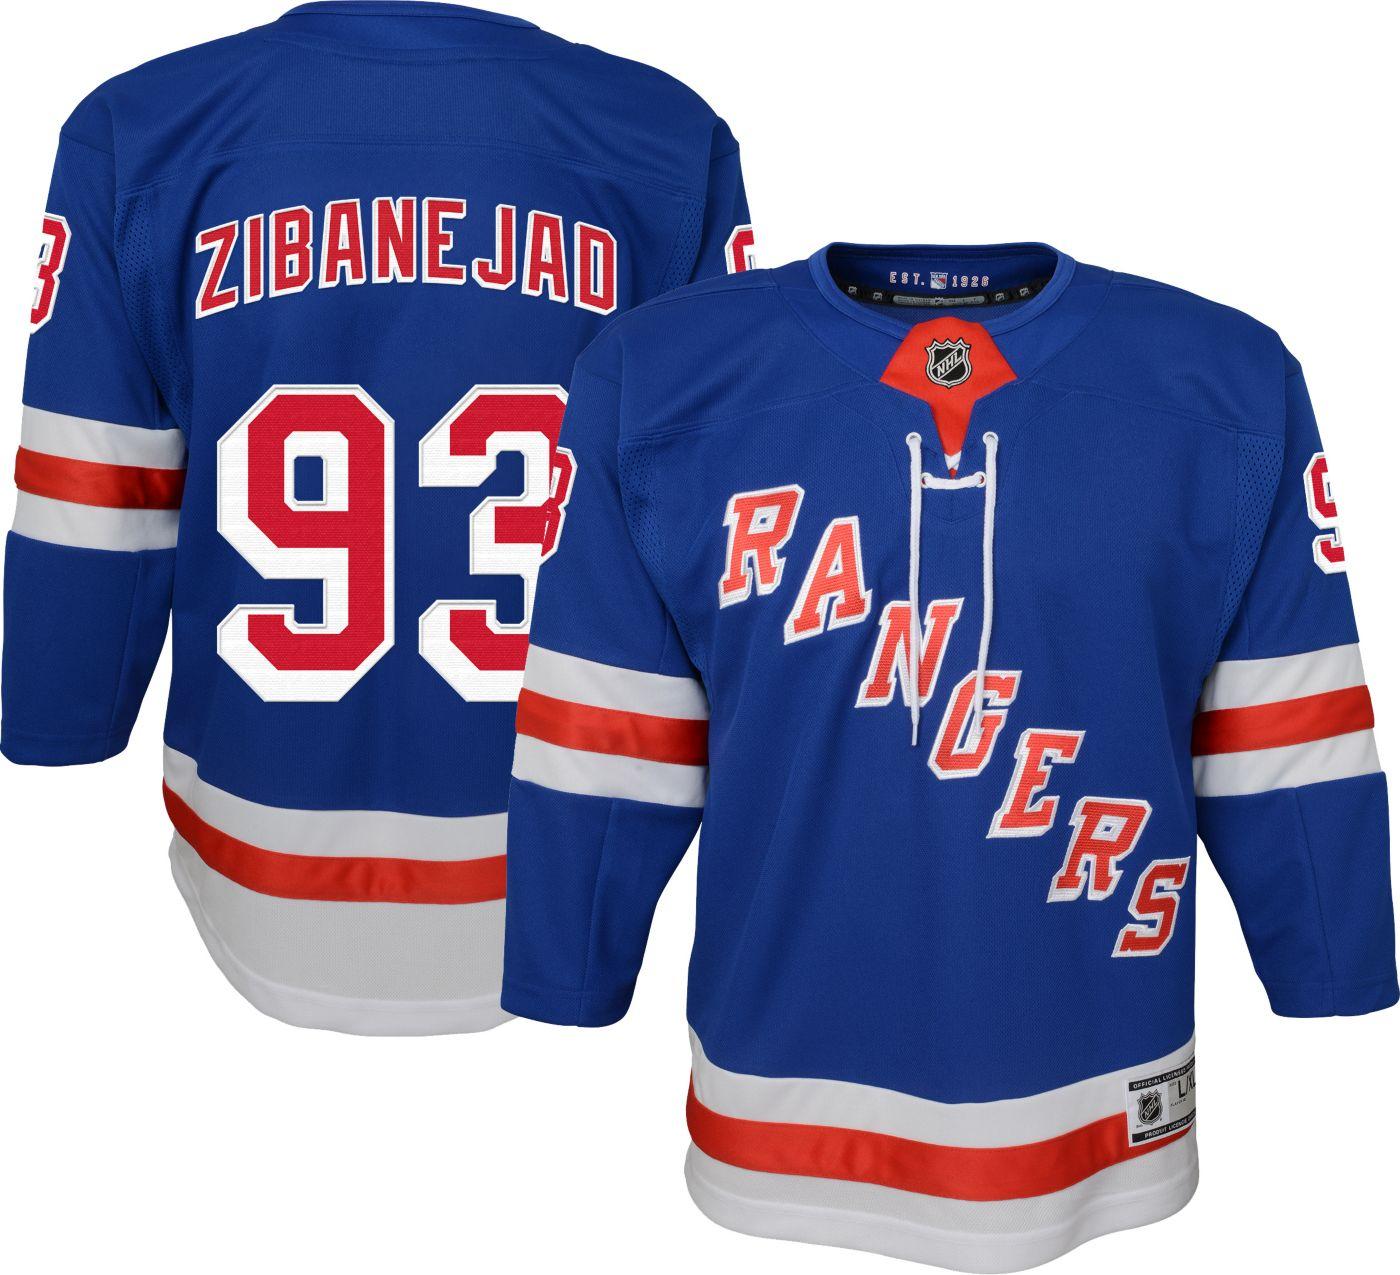 NHL Youth New York Rangers Mika Zibanejad #93 Premier Home Jersey